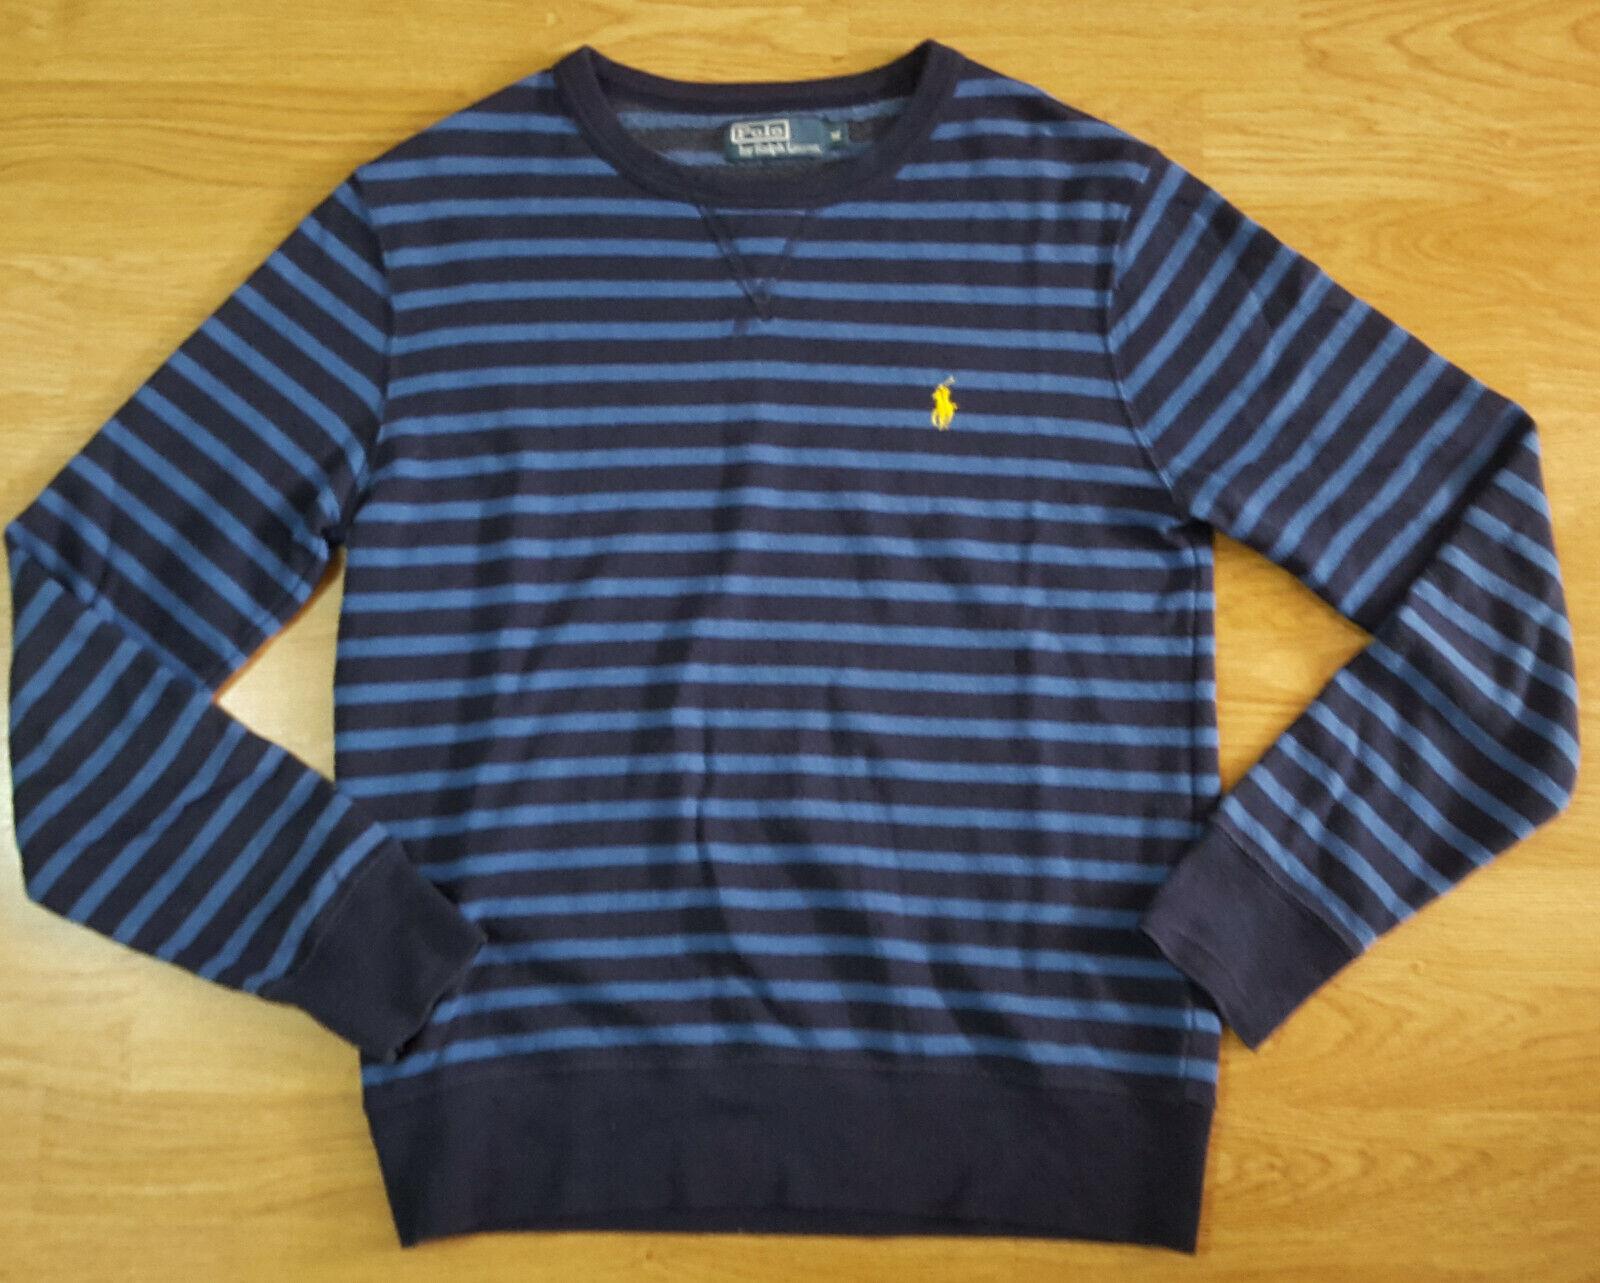 Ralph Lauren Polo Sweater Light Jumper oben Striped Blau Größe M